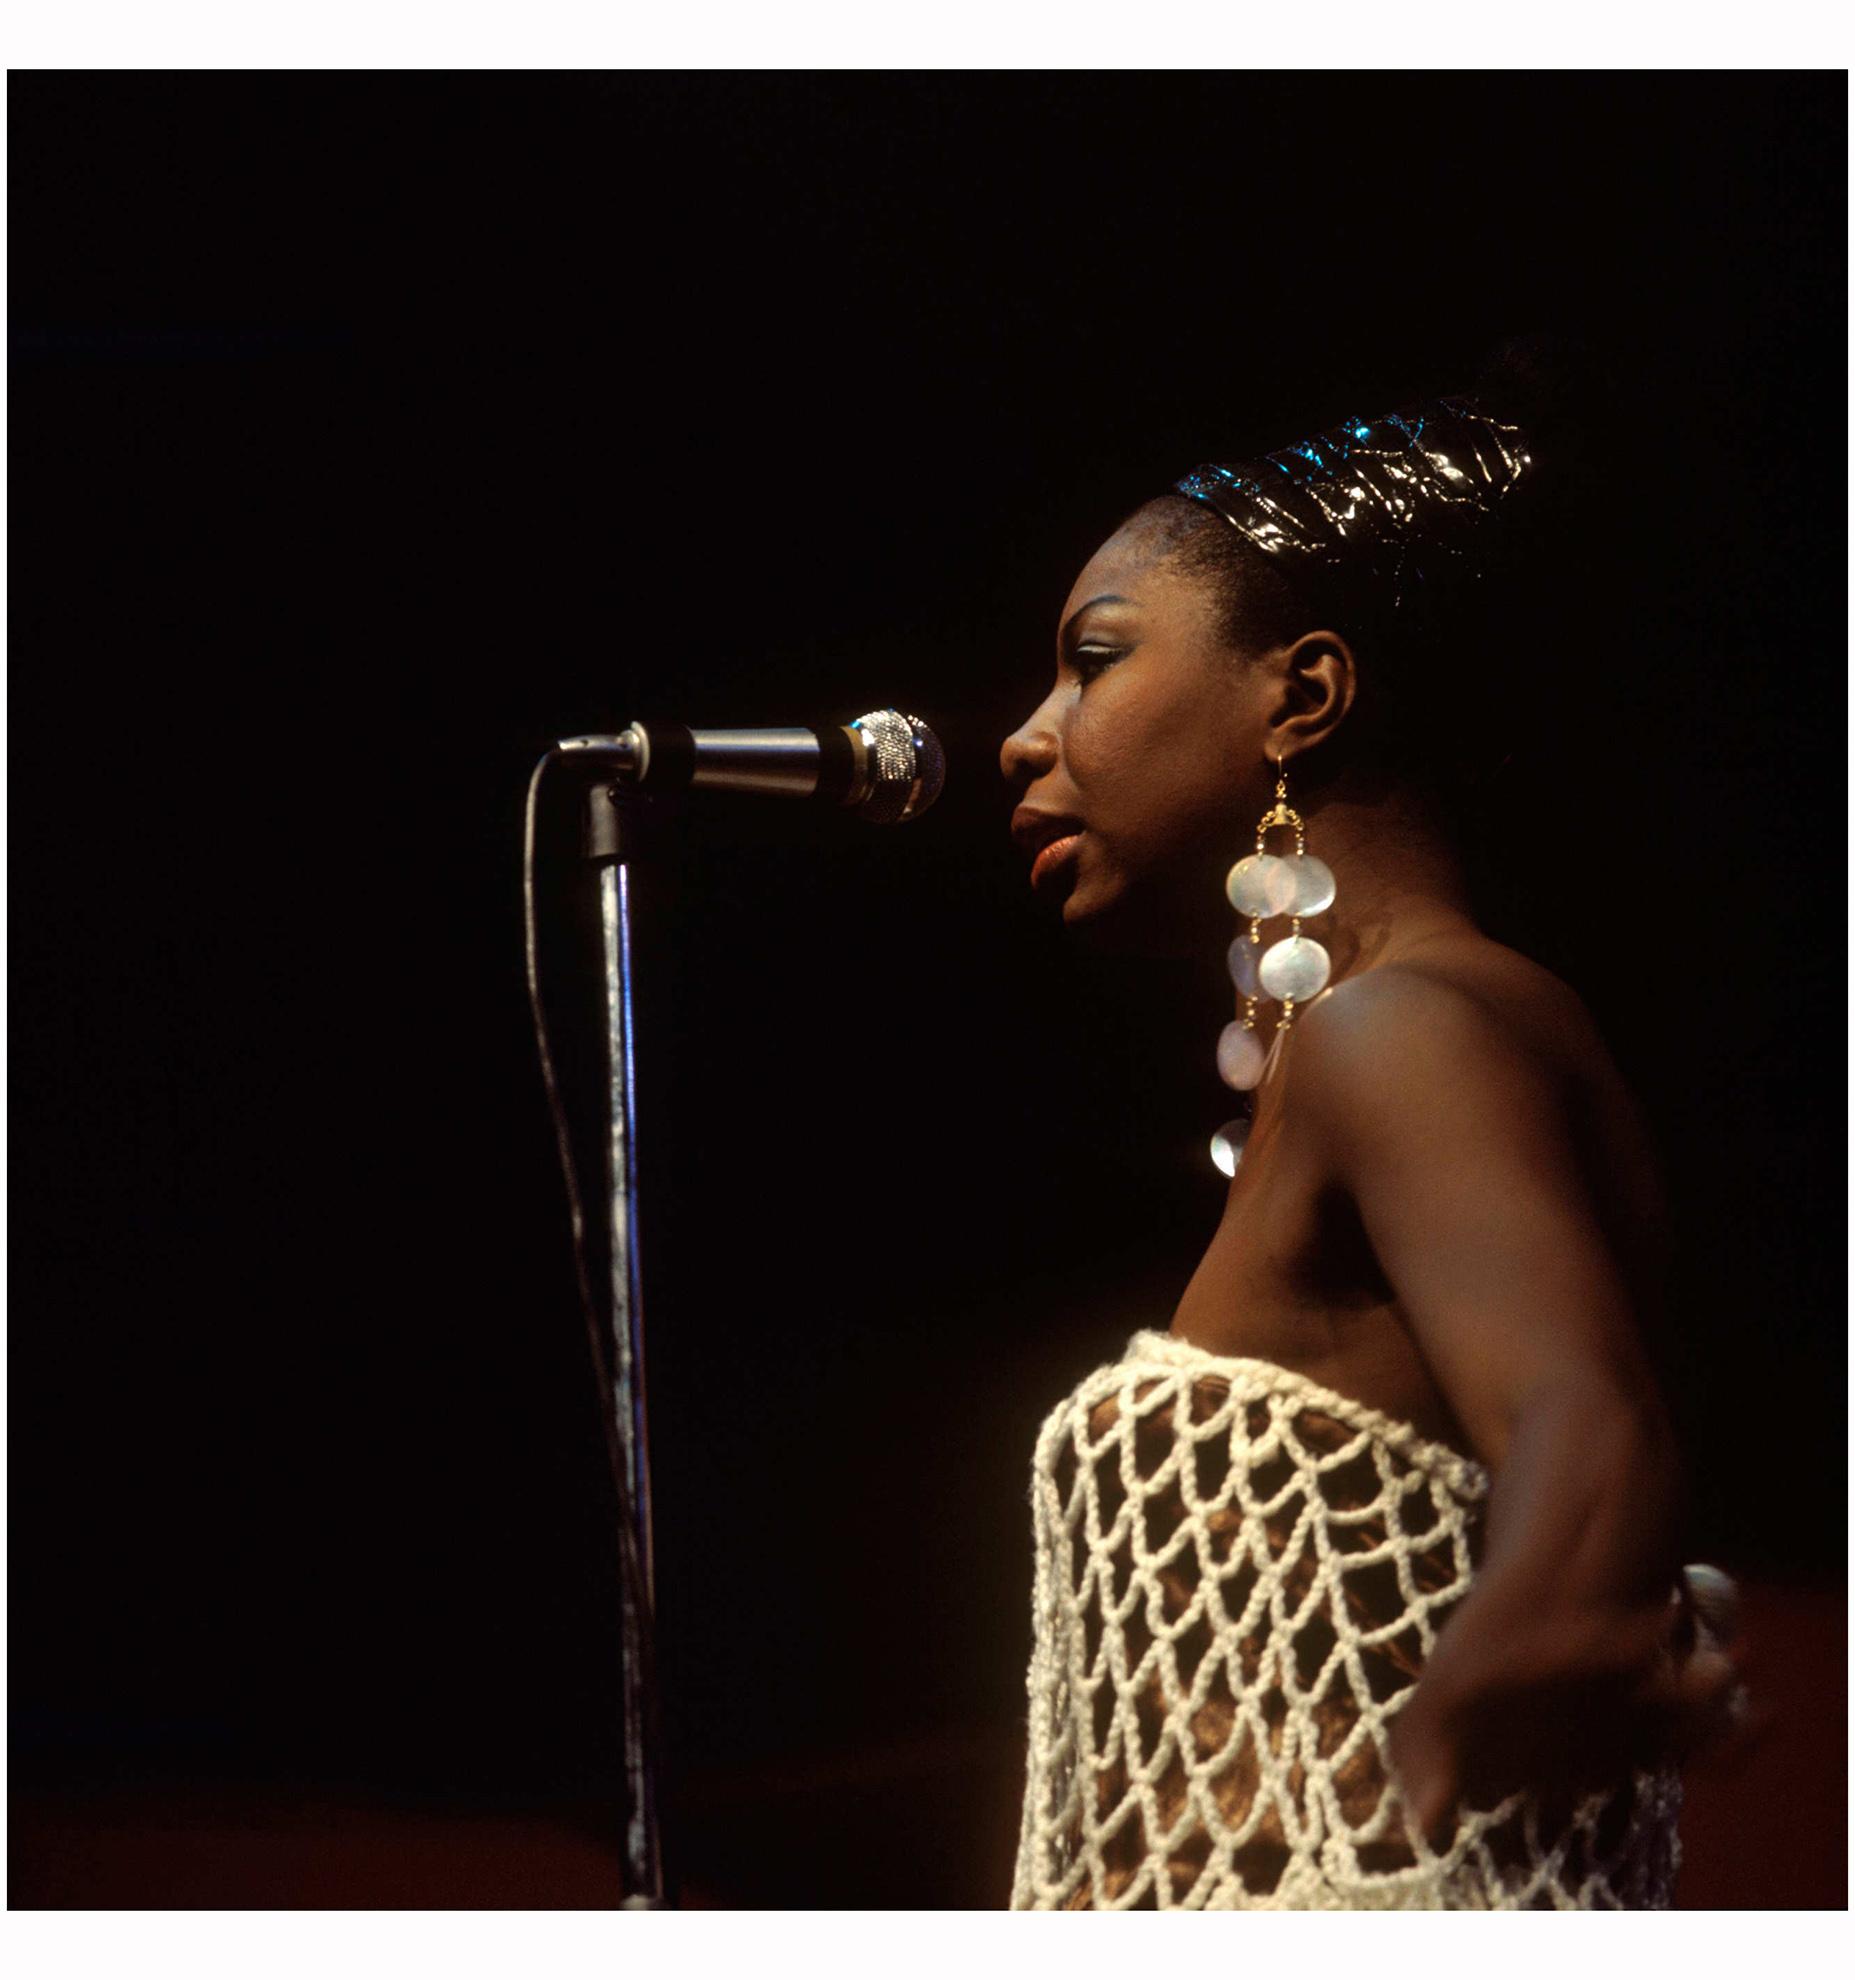 nina-simone-1967-photo-david-redfern